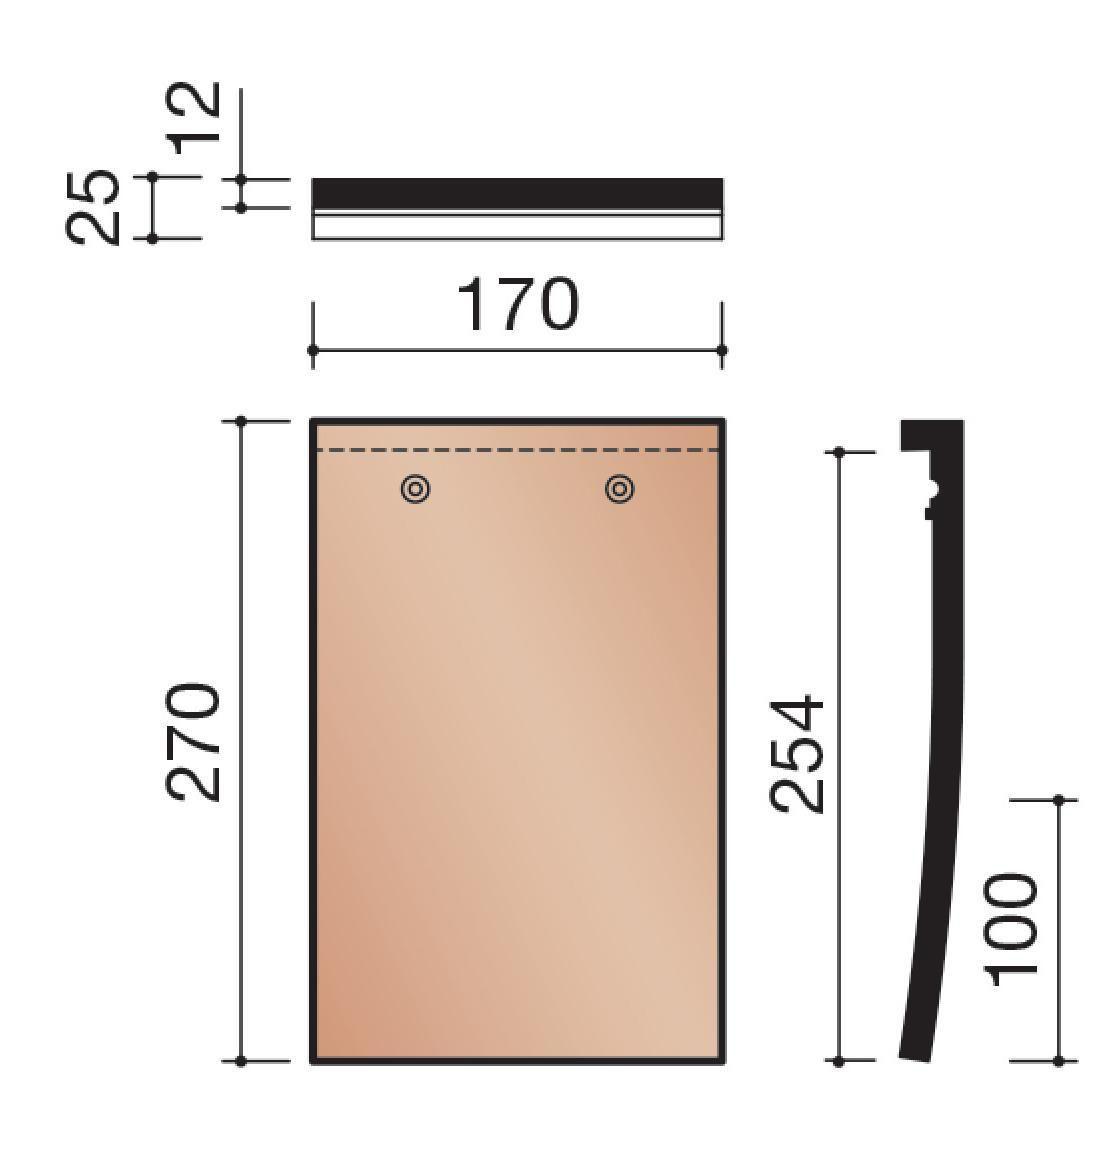 Koramic tuile plate 301 terre cuite rouge 270x170 - Prix tuile plate terre cuite ...